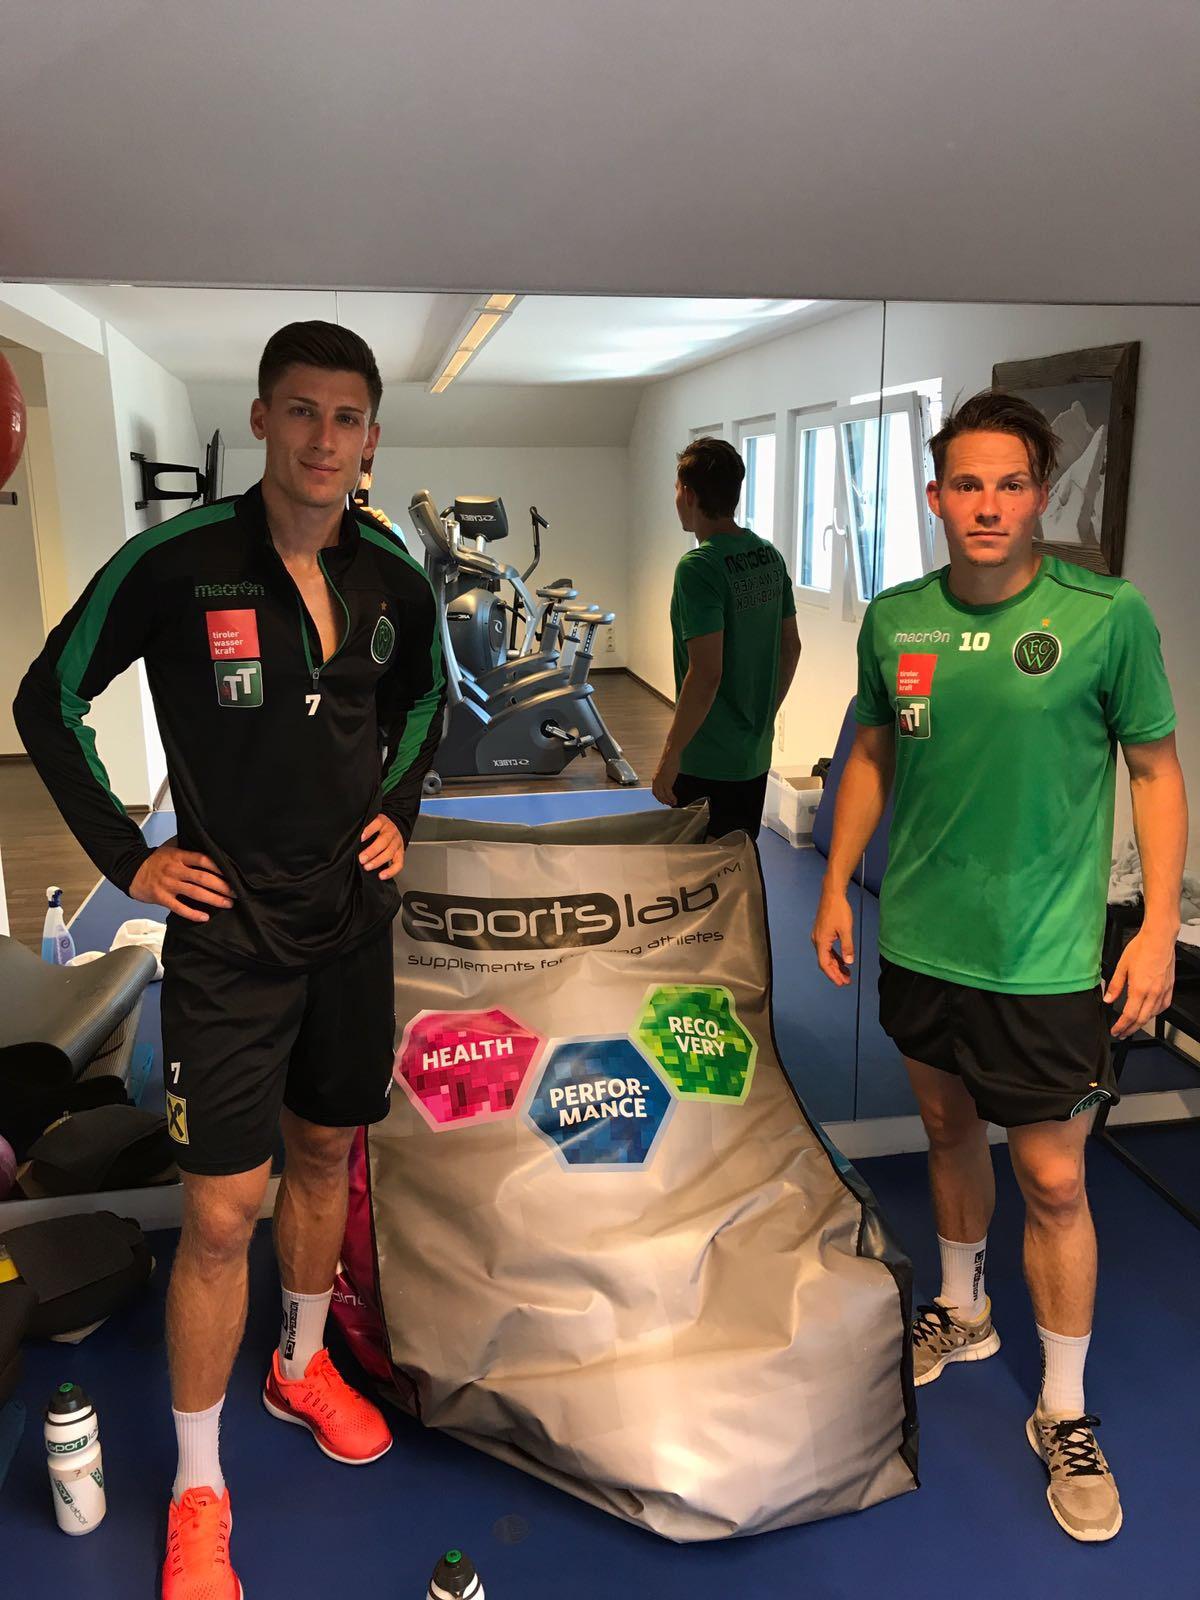 FC Wacker in der medalp Zillertal -